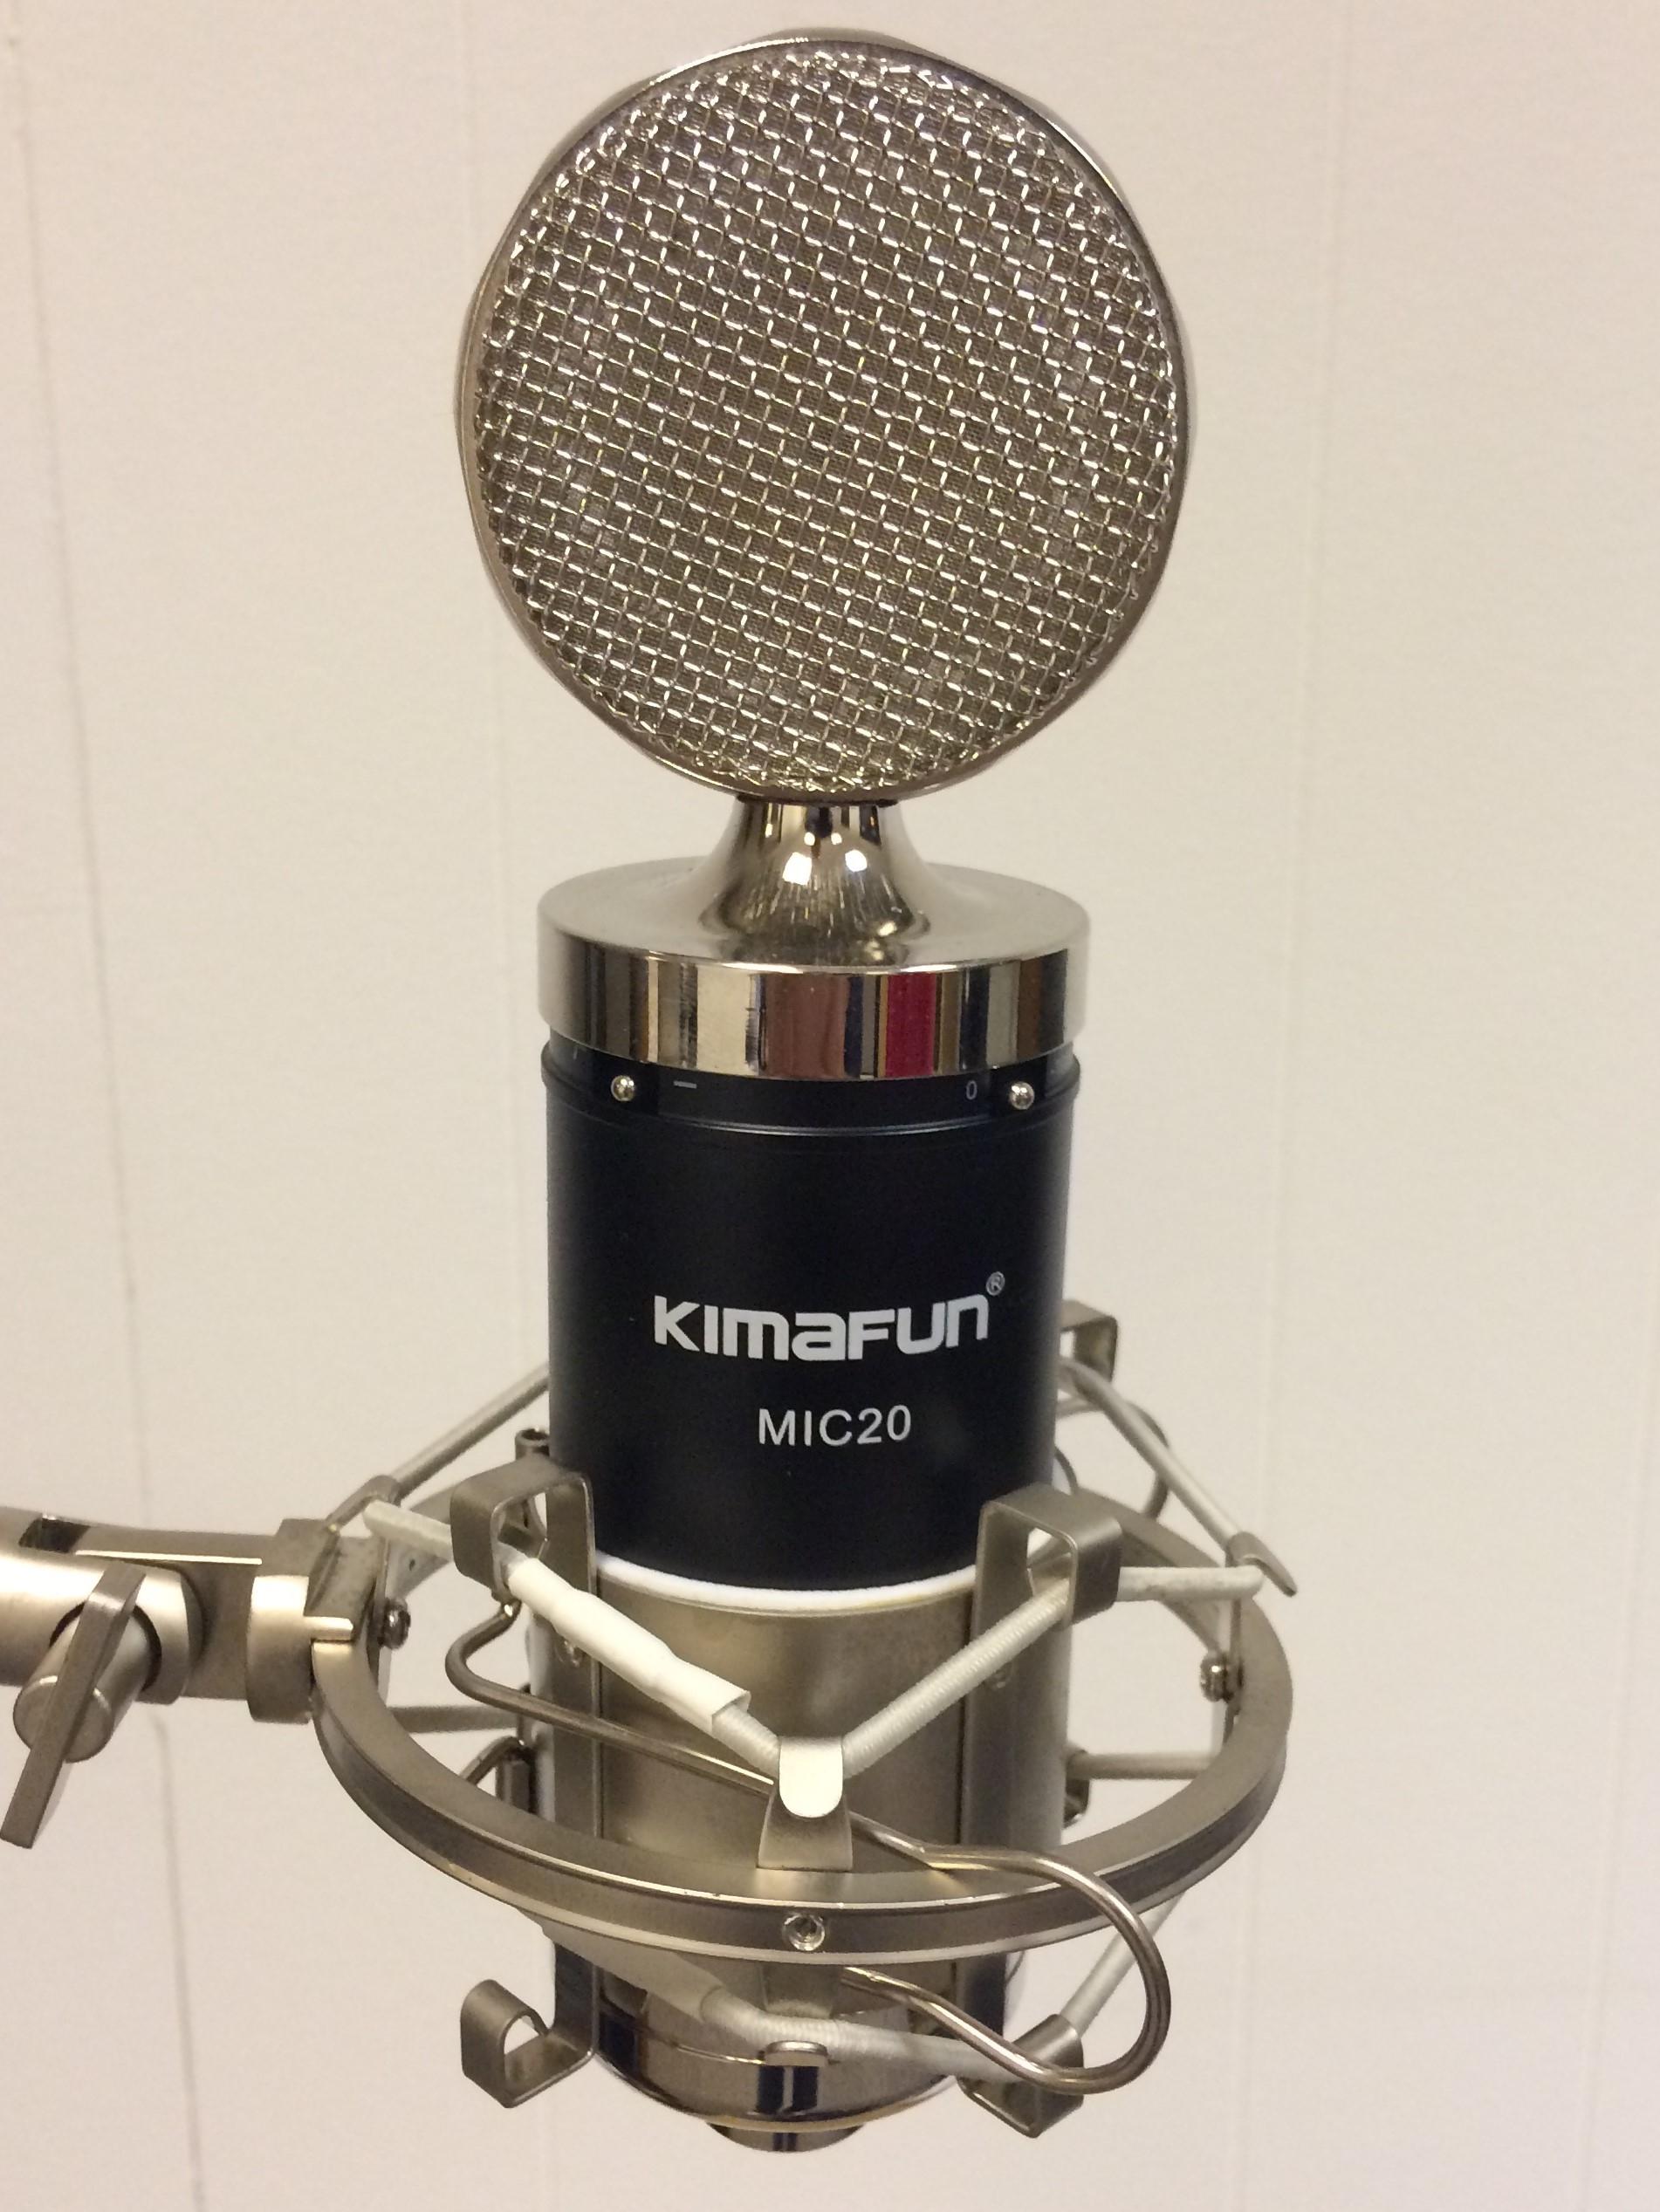 Large Diaphragm condenser MIC20 professionel kondensator mikrofon